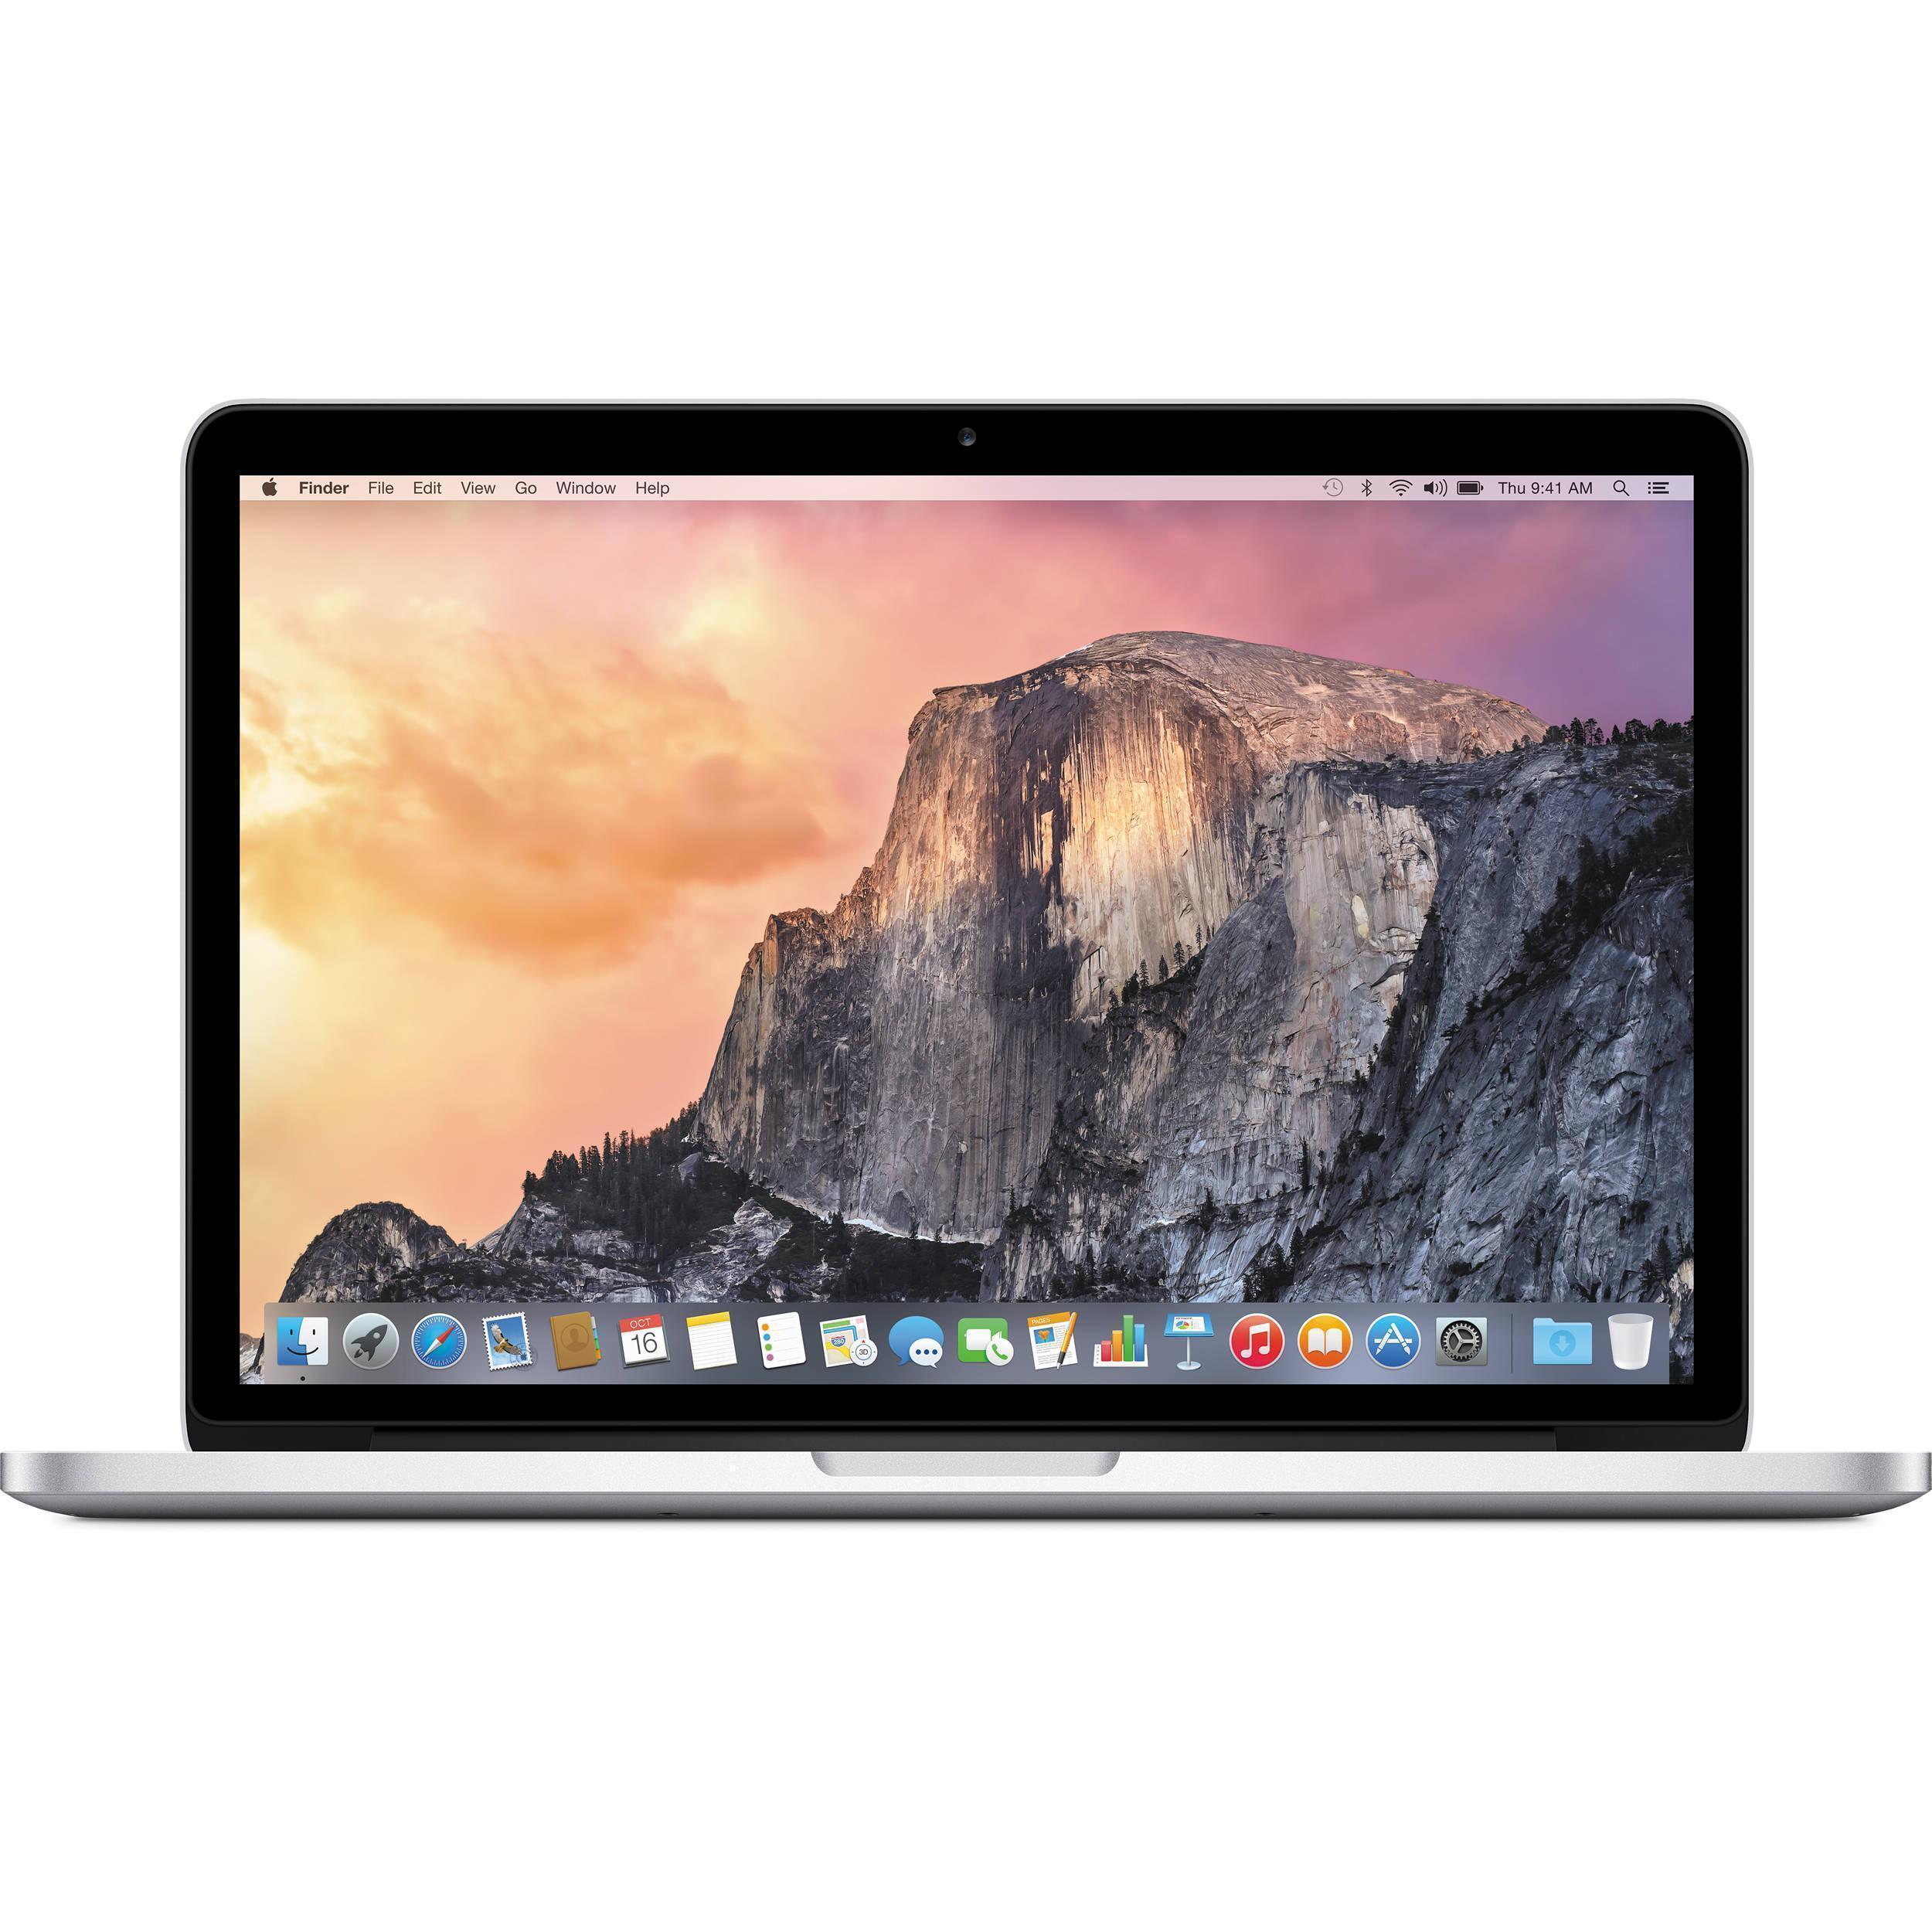 MacBook Pro Retina 13,3-inch (2013) - Core i7 - 16GB - SSD 512 GB AZERTY - Francês